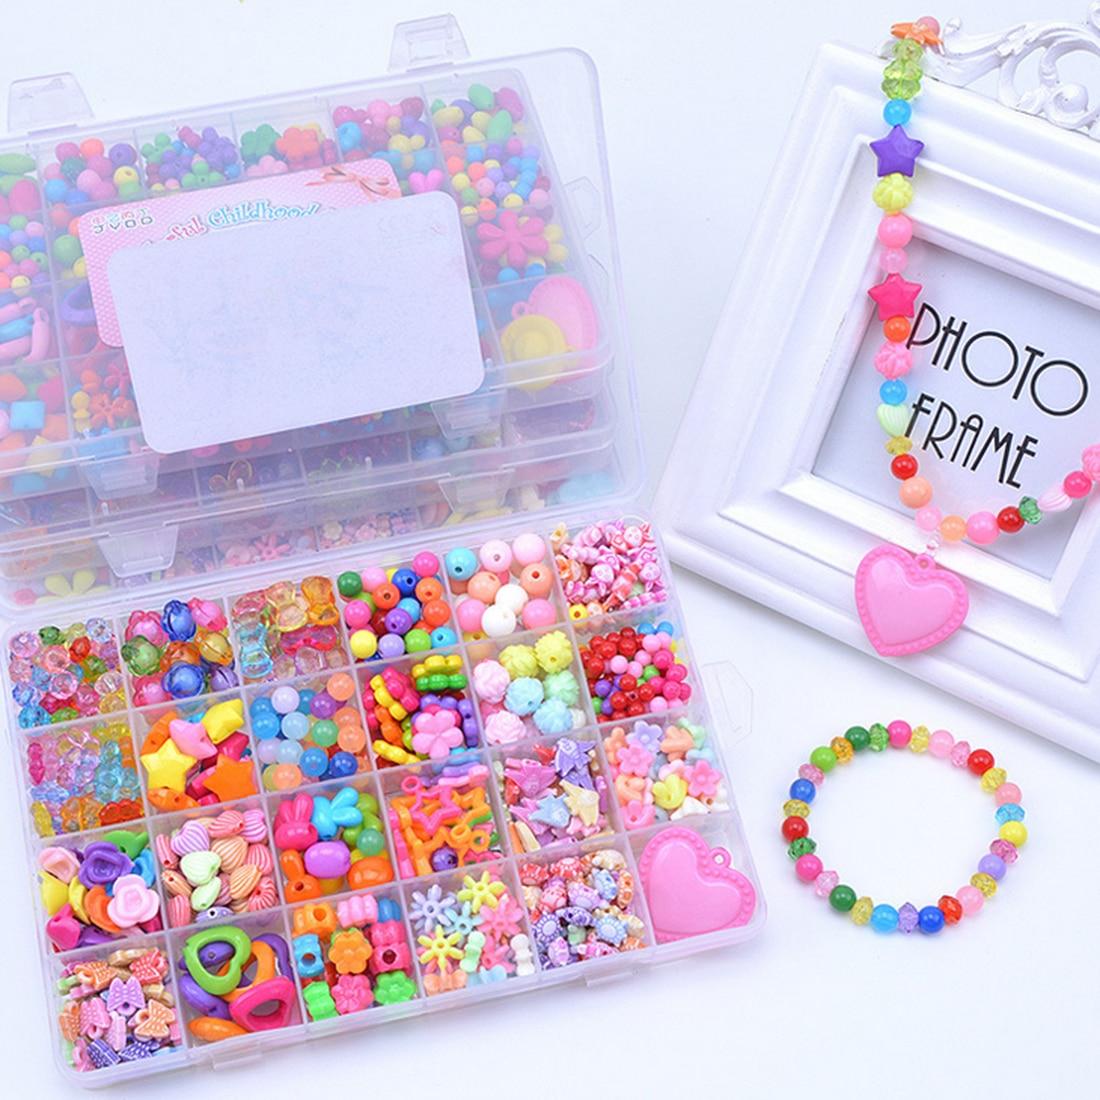 24 Grids Kids Acrylic Colorful DIY Beads Set Girls Necklace Bracelet Making Craft Kit Box Kid Gifts ...